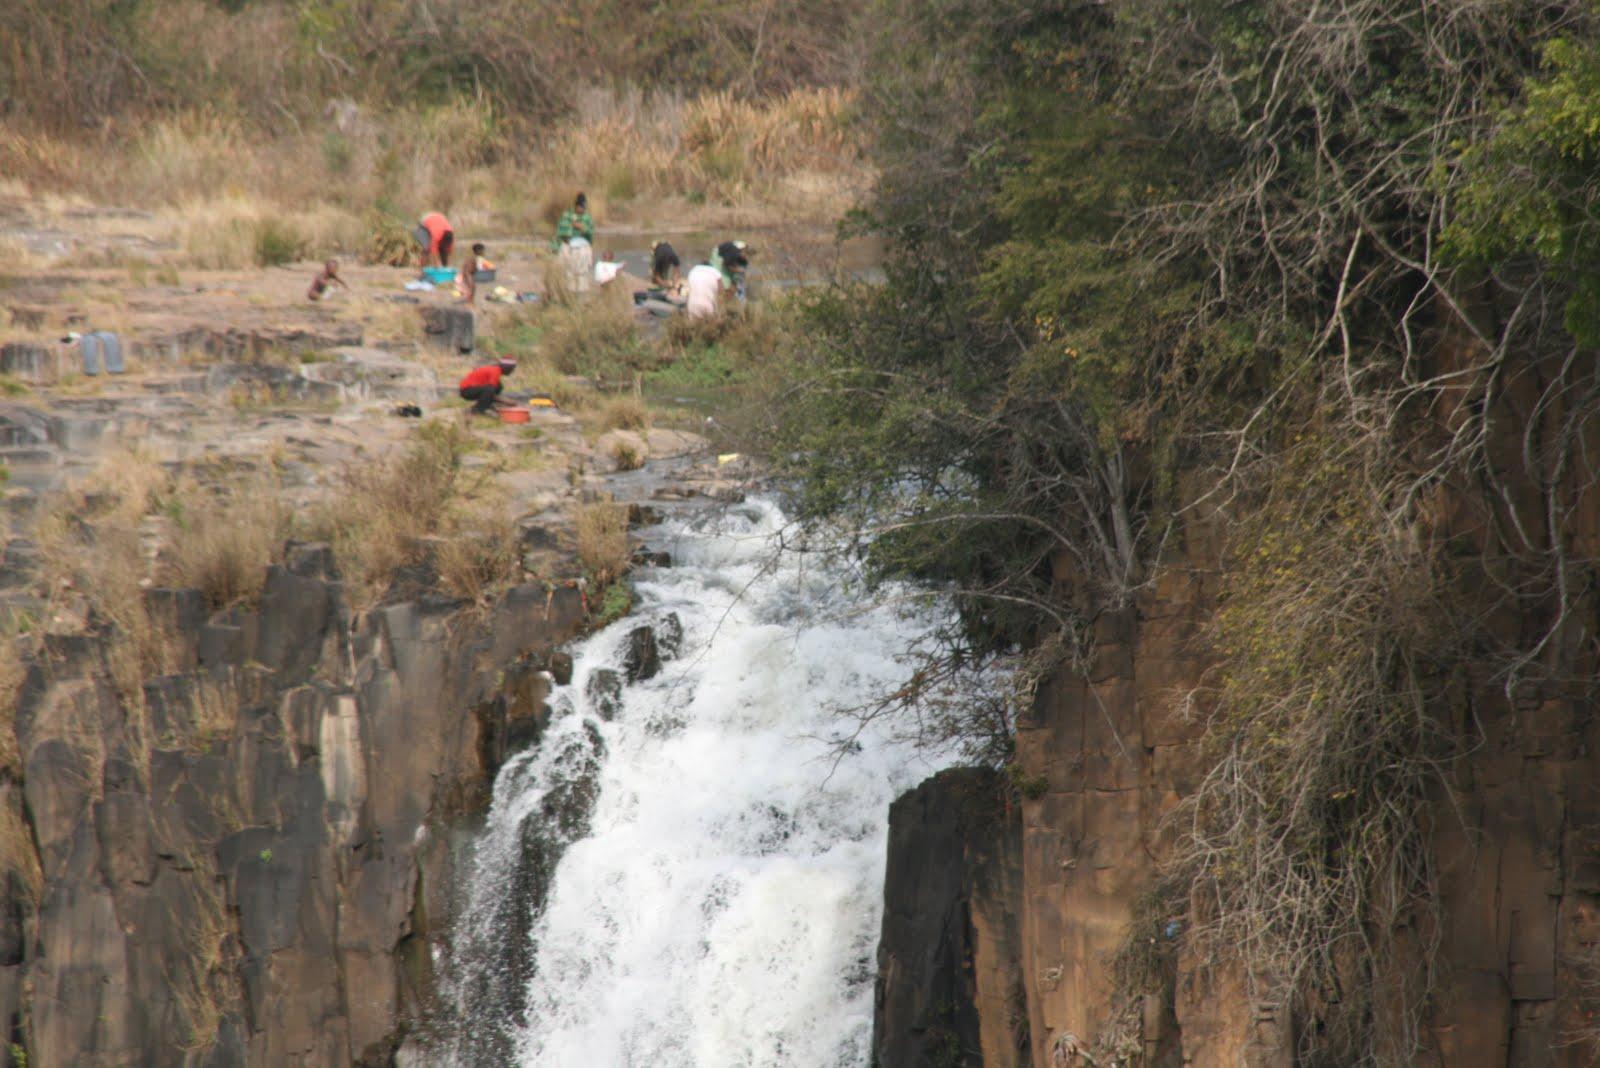 Memorias de sud frica cap tulo ii durban umhlaga for Provincia sudafricana con durban